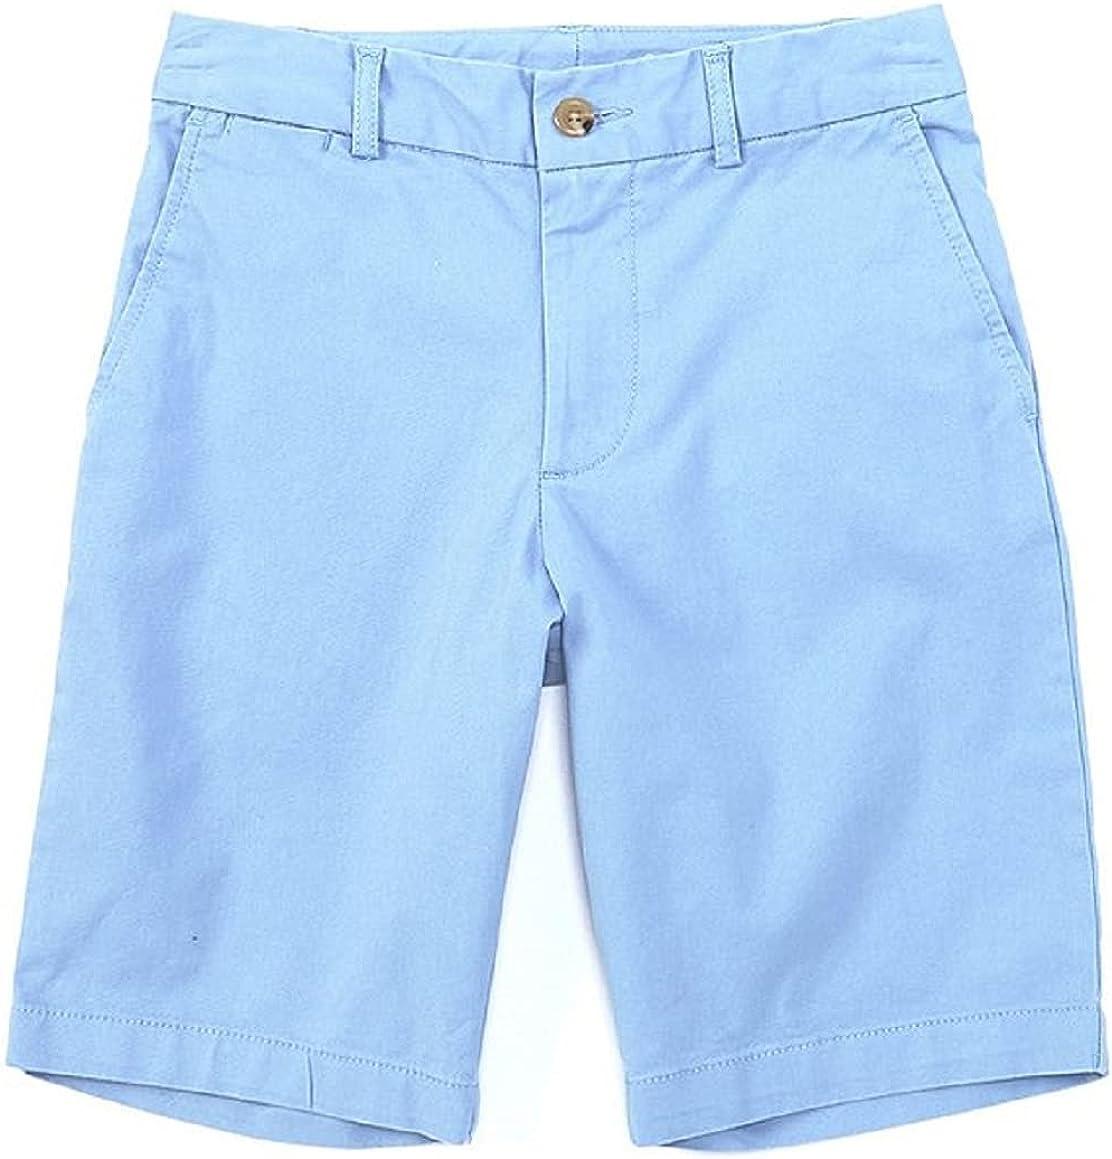 Ralph Lauren Boys Soft Aqua Flat-Front Oxford Shorts, US 16 Boys